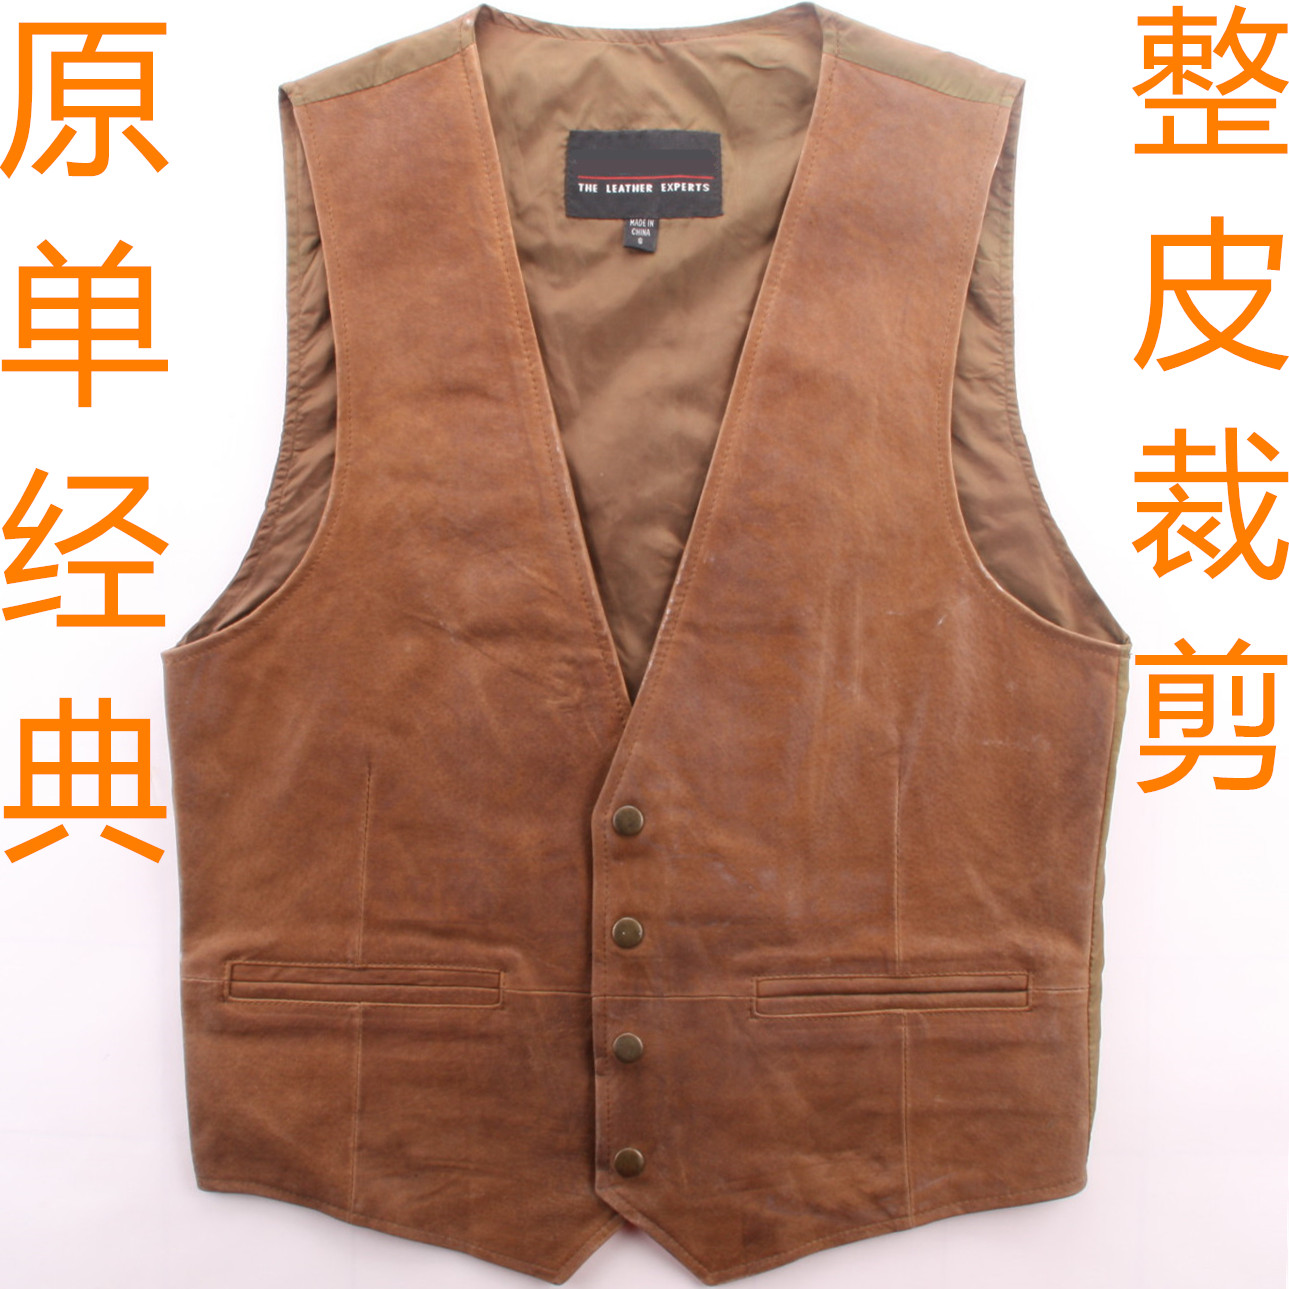 Leather Vest Western Cowboy vest mens and womens Leather Classic waistcoat suit vest motorcycle riding vest